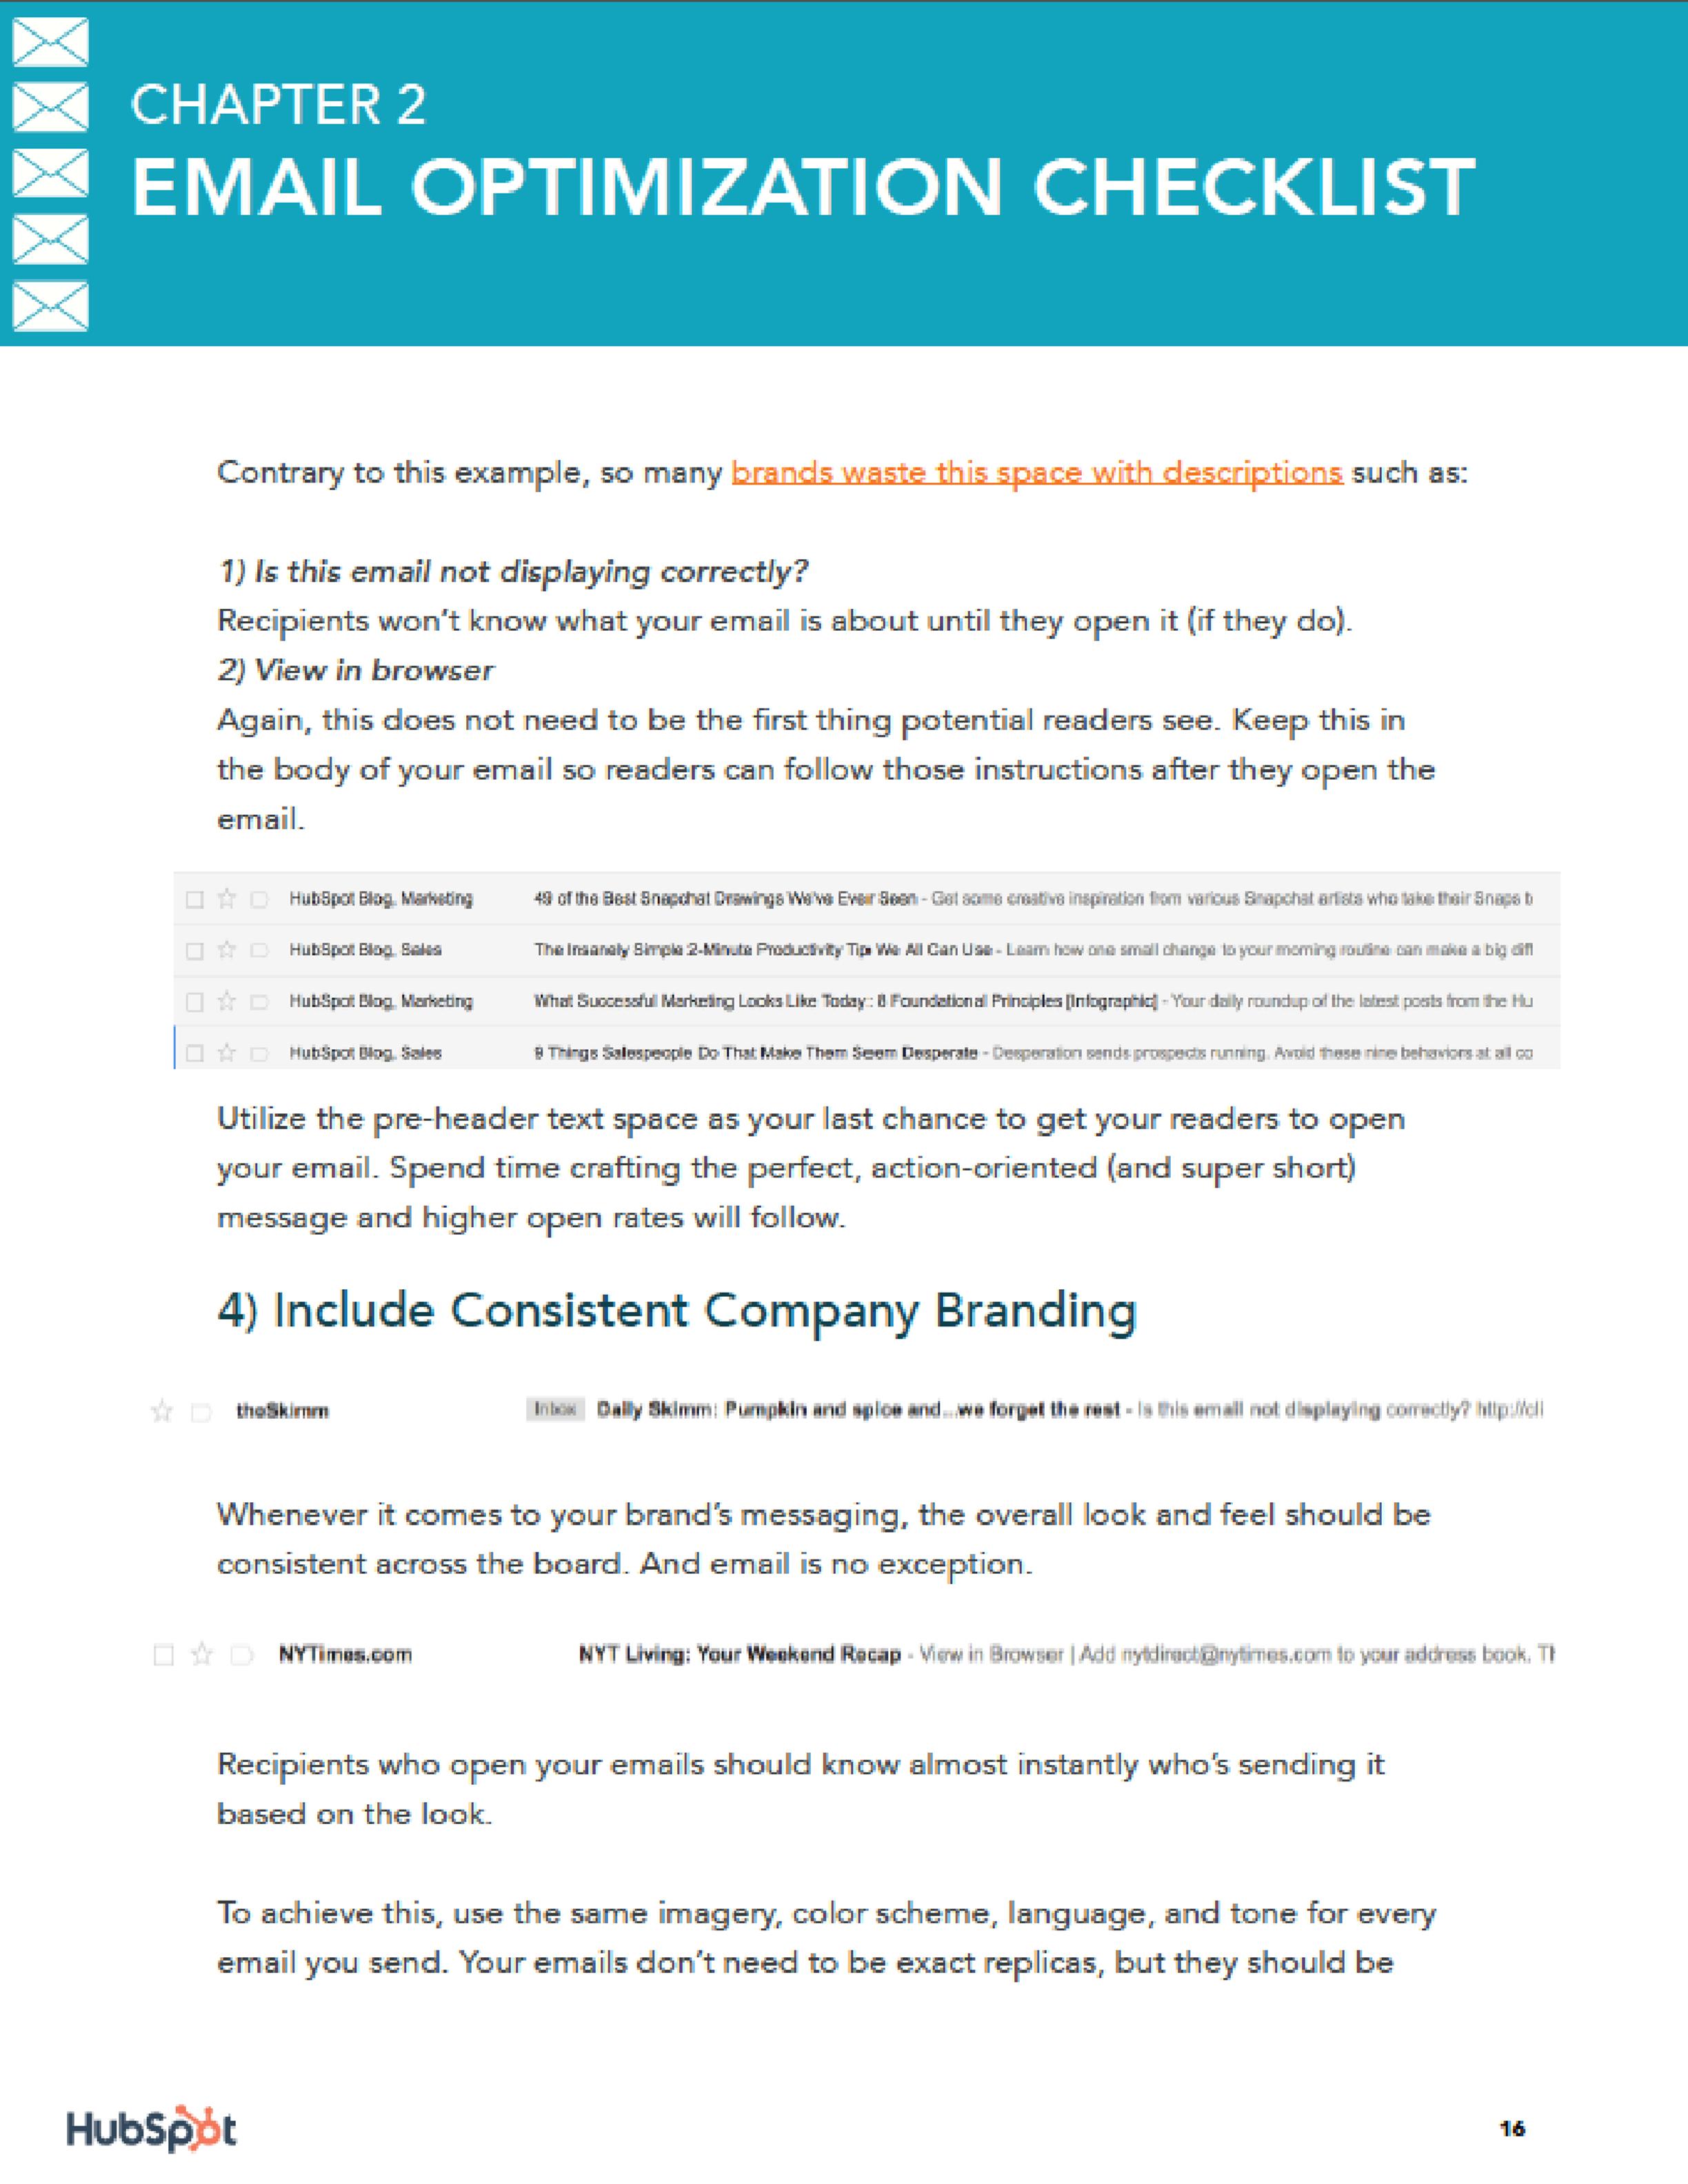 Email Optimization Checklist for Startups and Entrepreneurs